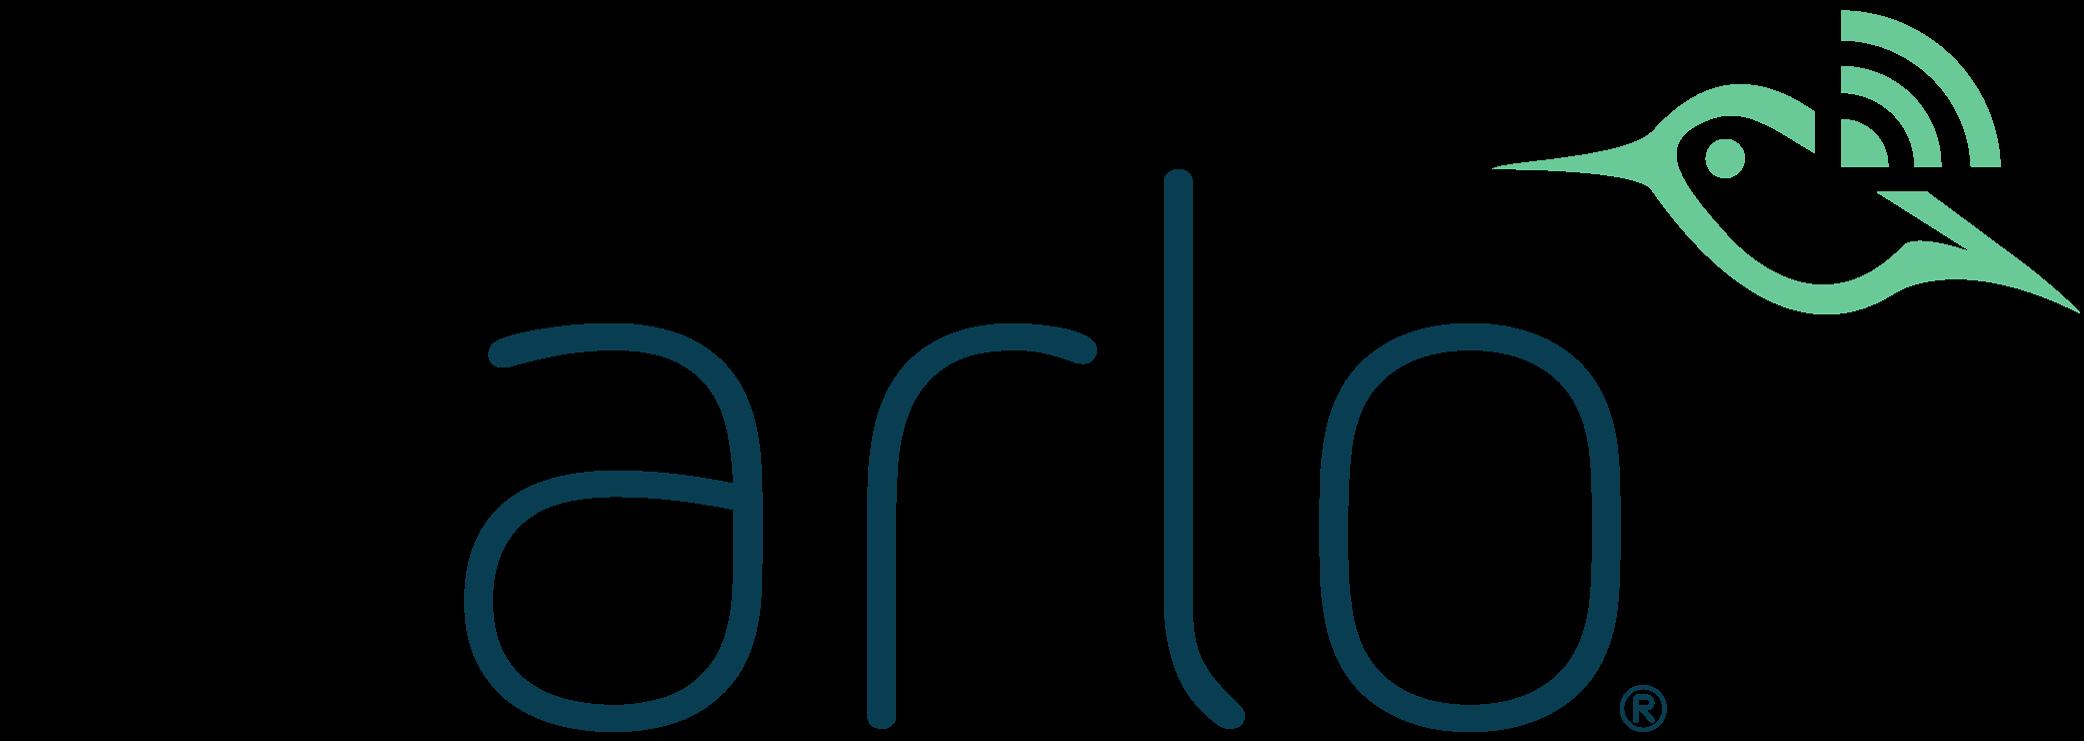 Arlo-logo